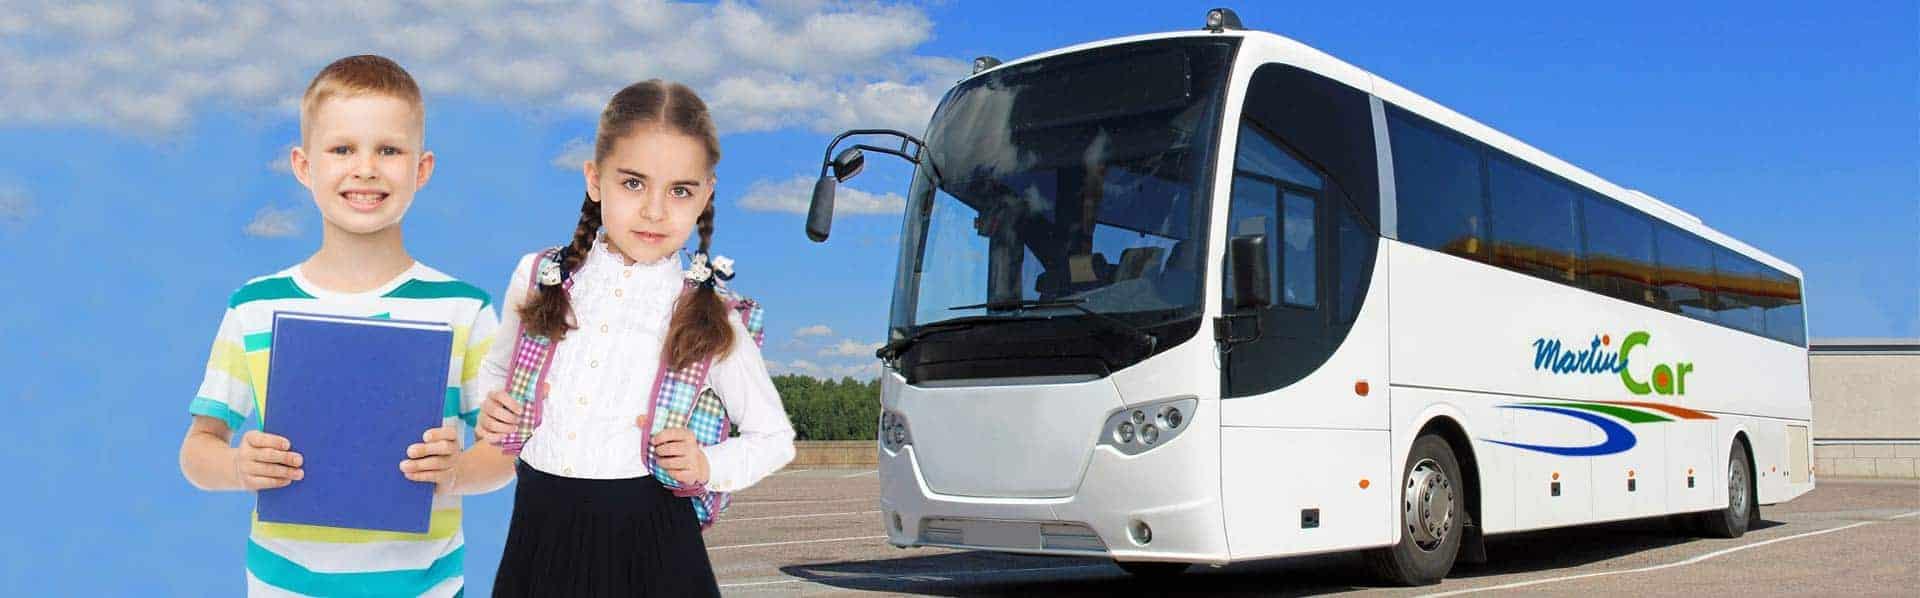 Slider transporte escolar